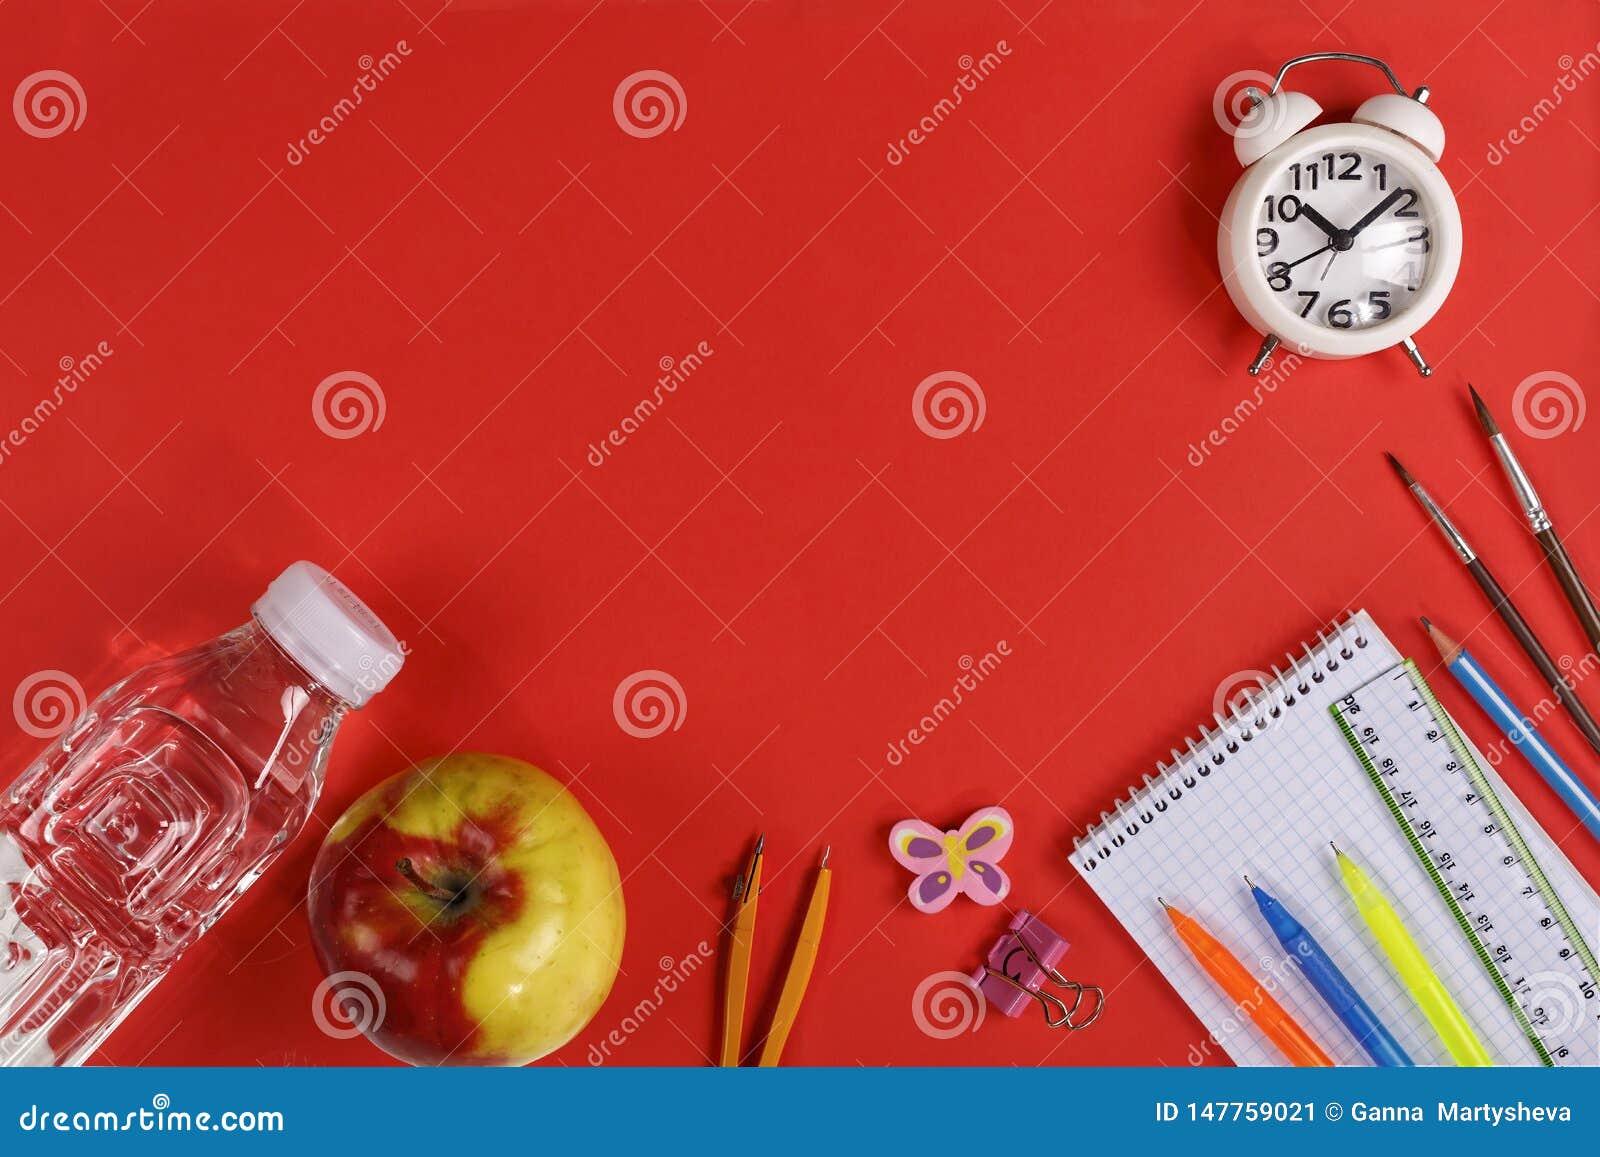 Healthy, school food, ciabatta, nutrition, pure water, a sandwich, an apple